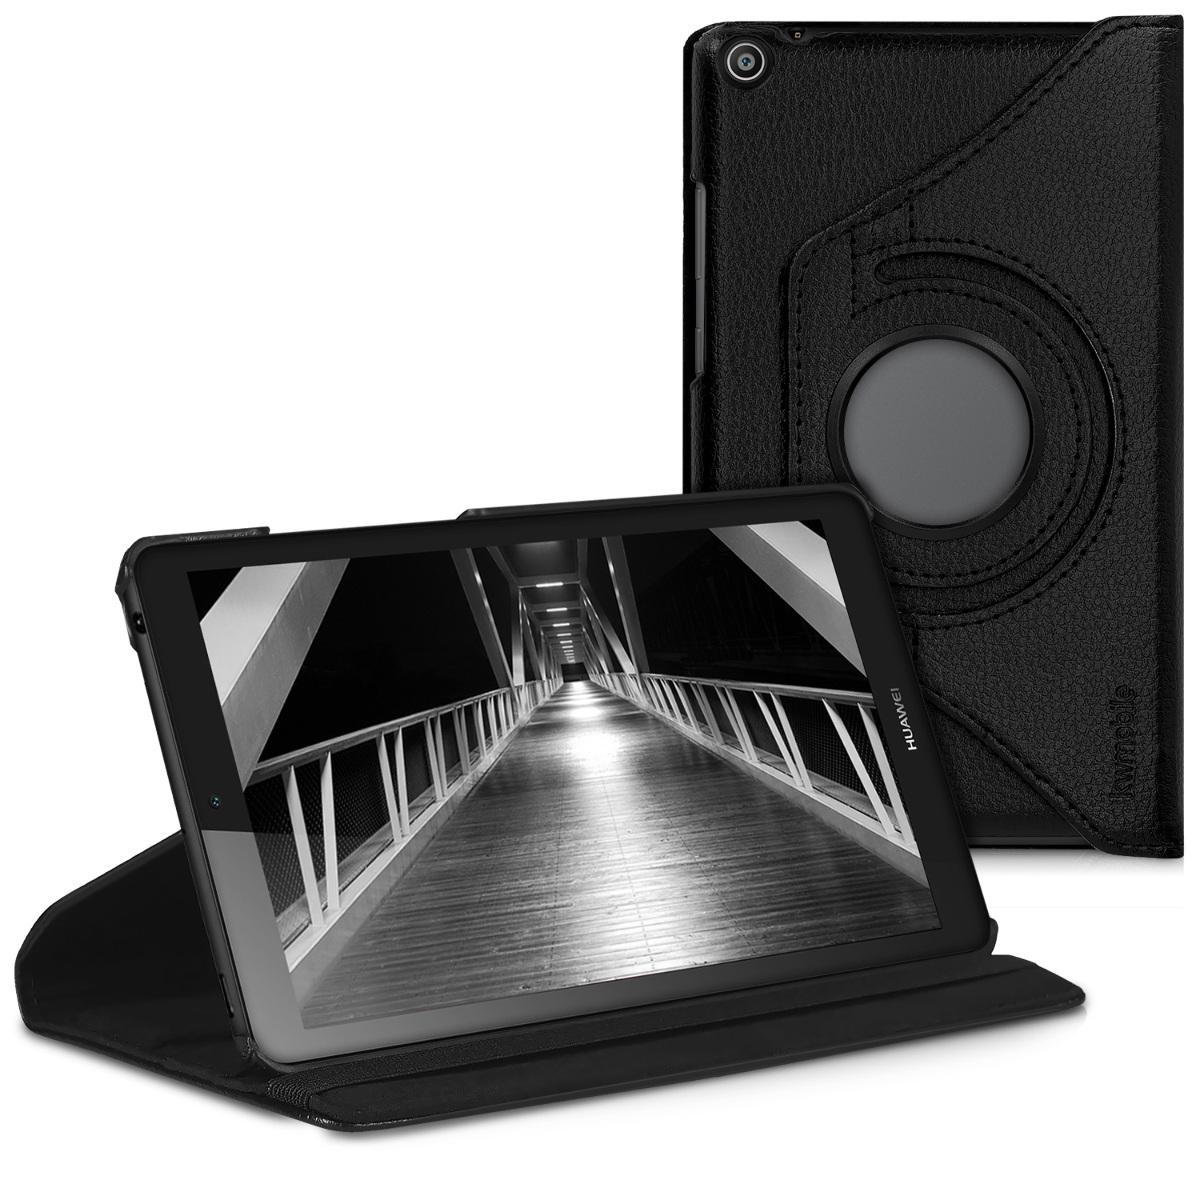 KW Θήκη 360° Huawei MediaPad T3 7.0 - Συνθετικό Δέρμα - Black (43161.01)